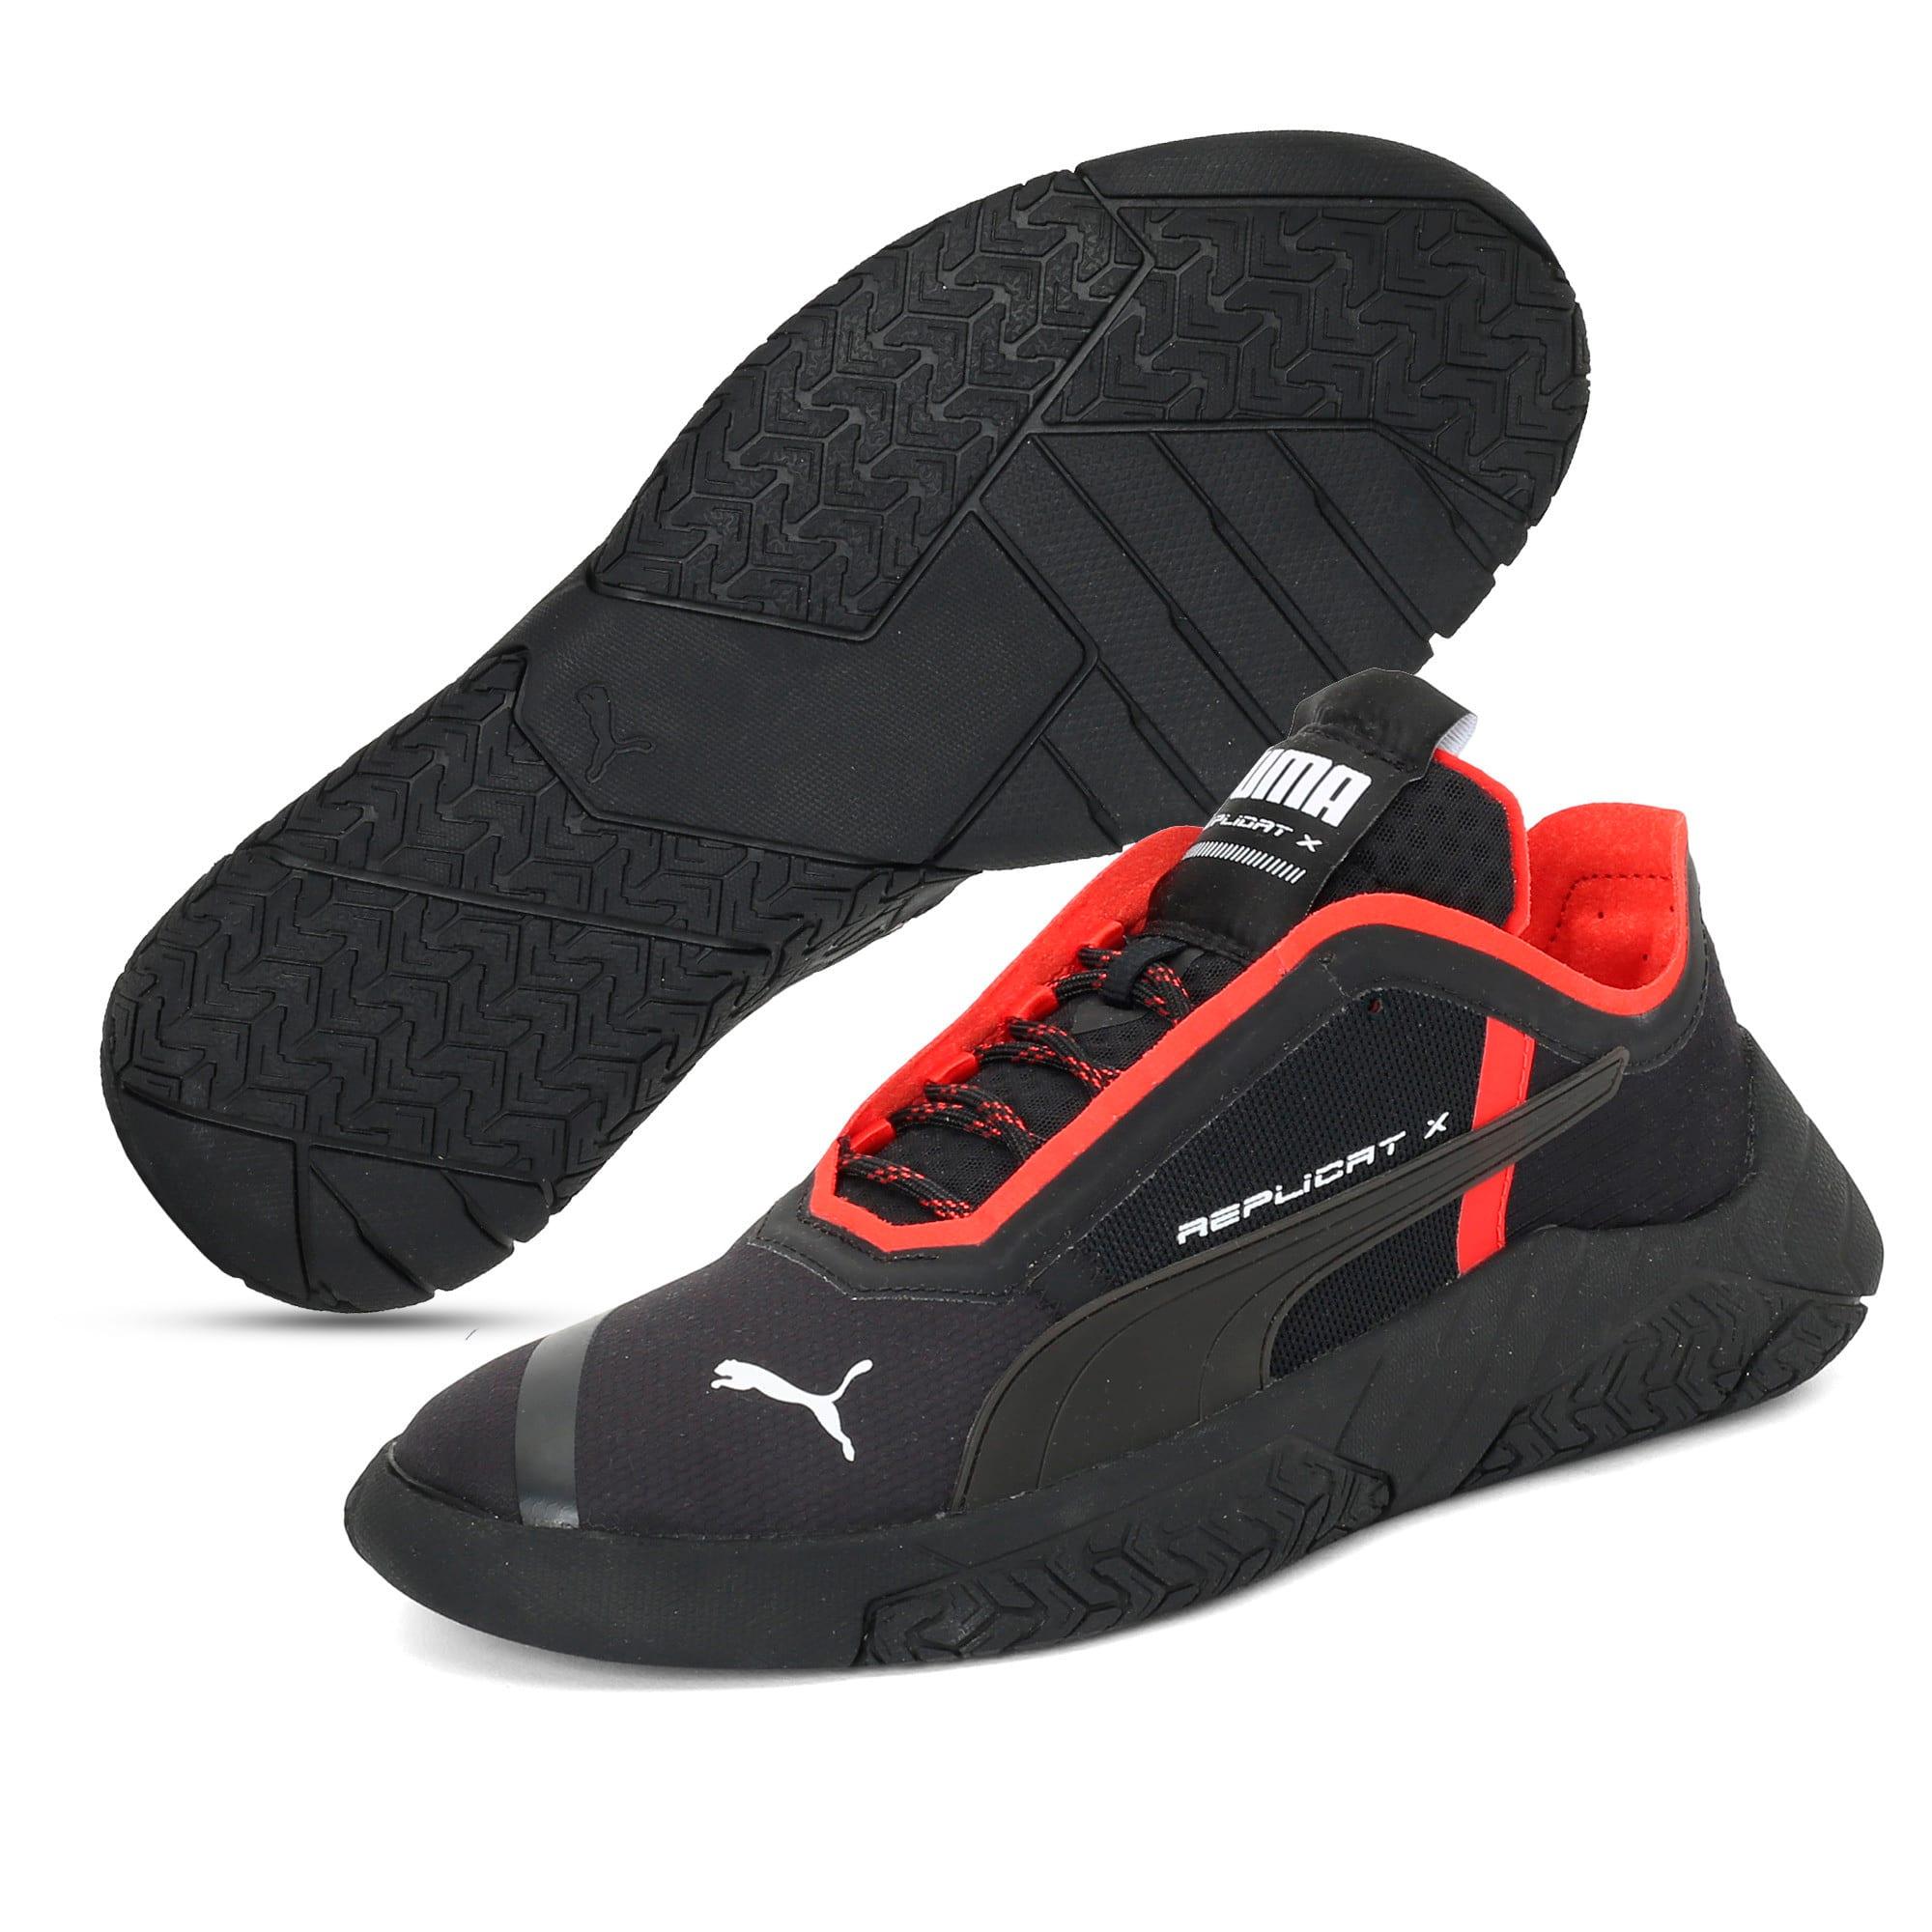 Thumbnail 3 of Replicat-X Circuit Trainers, Puma Black-Puma Red, medium-IND